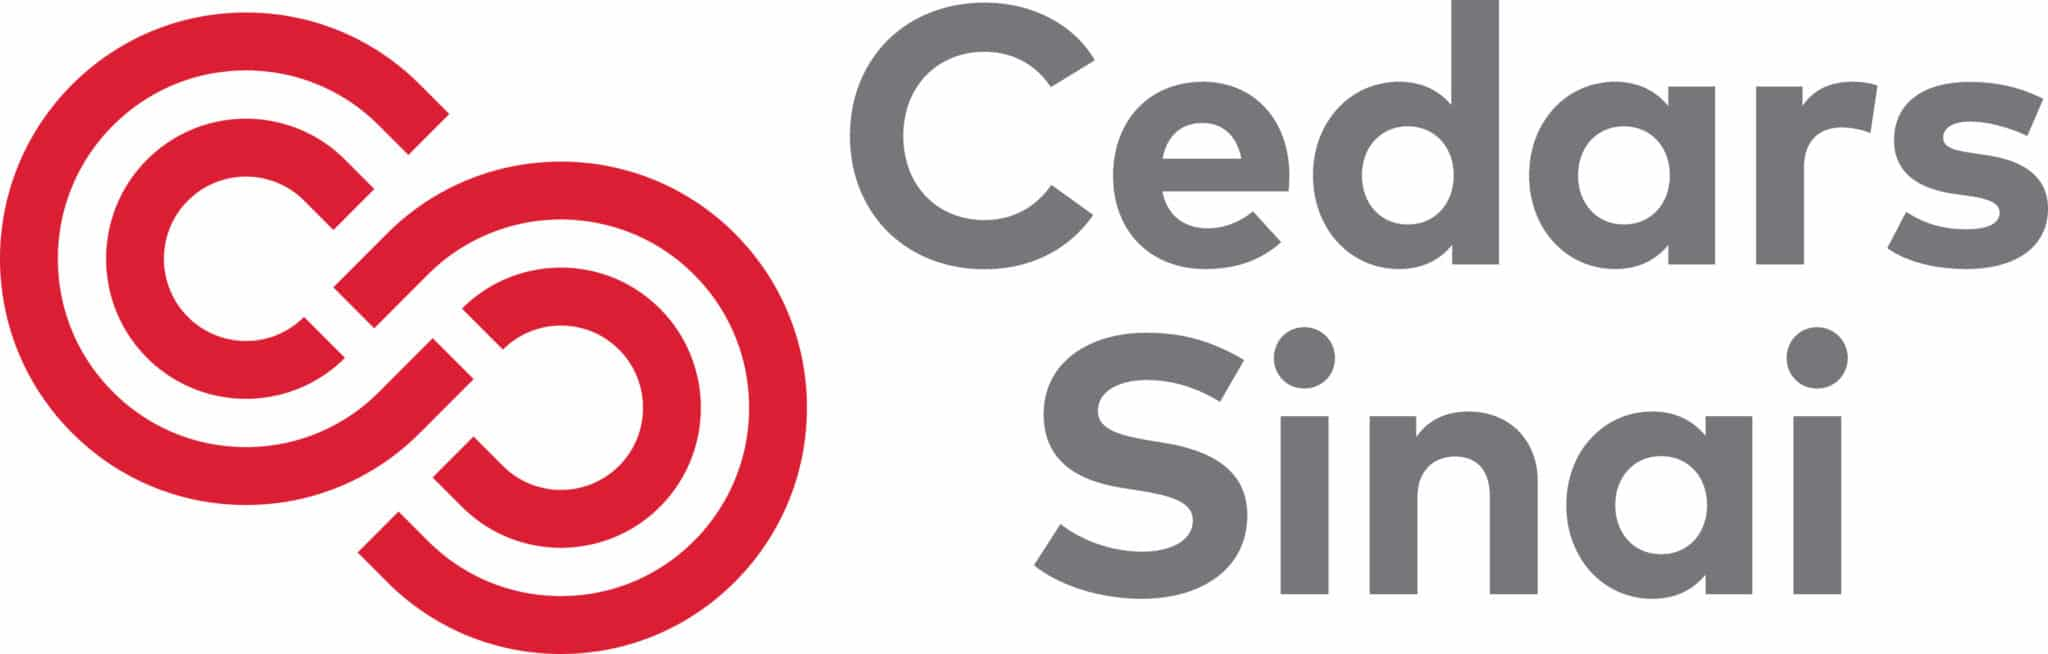 Cedars Sinai logo